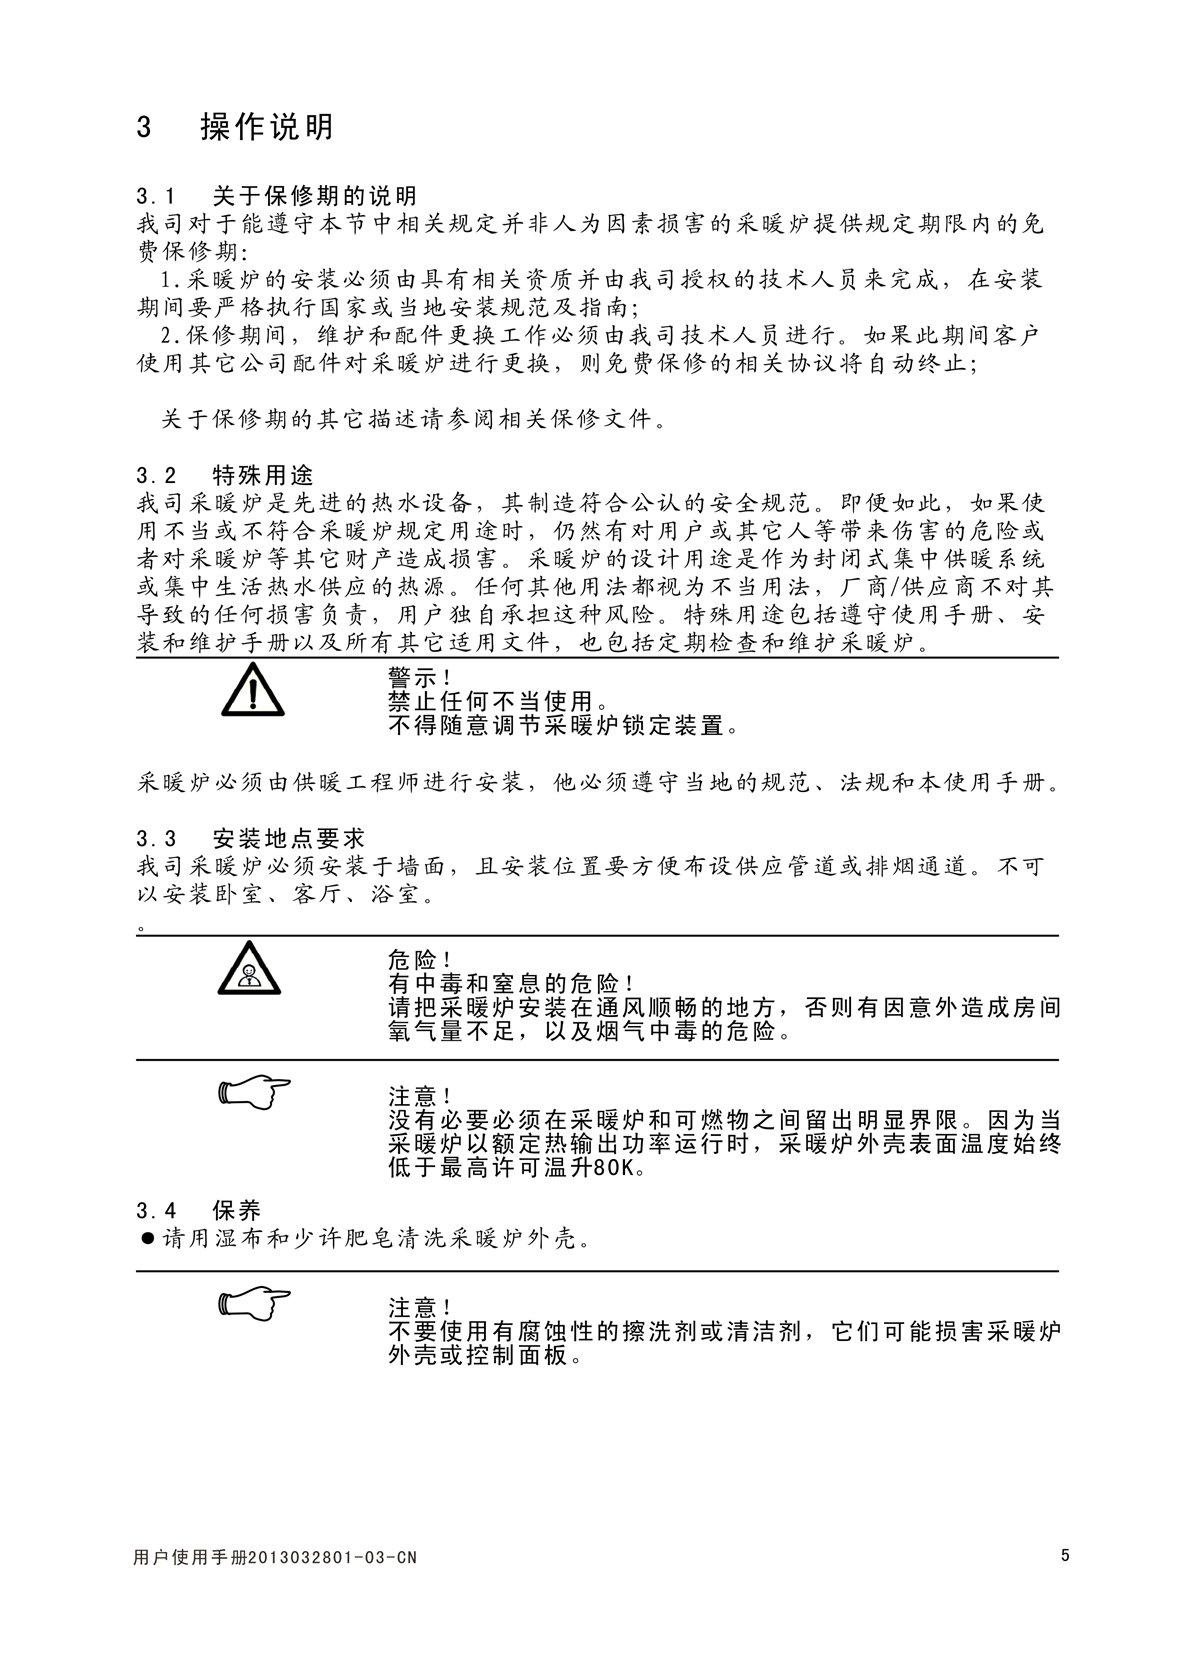 ES16B系列-用户使用手册-6_02.jpg